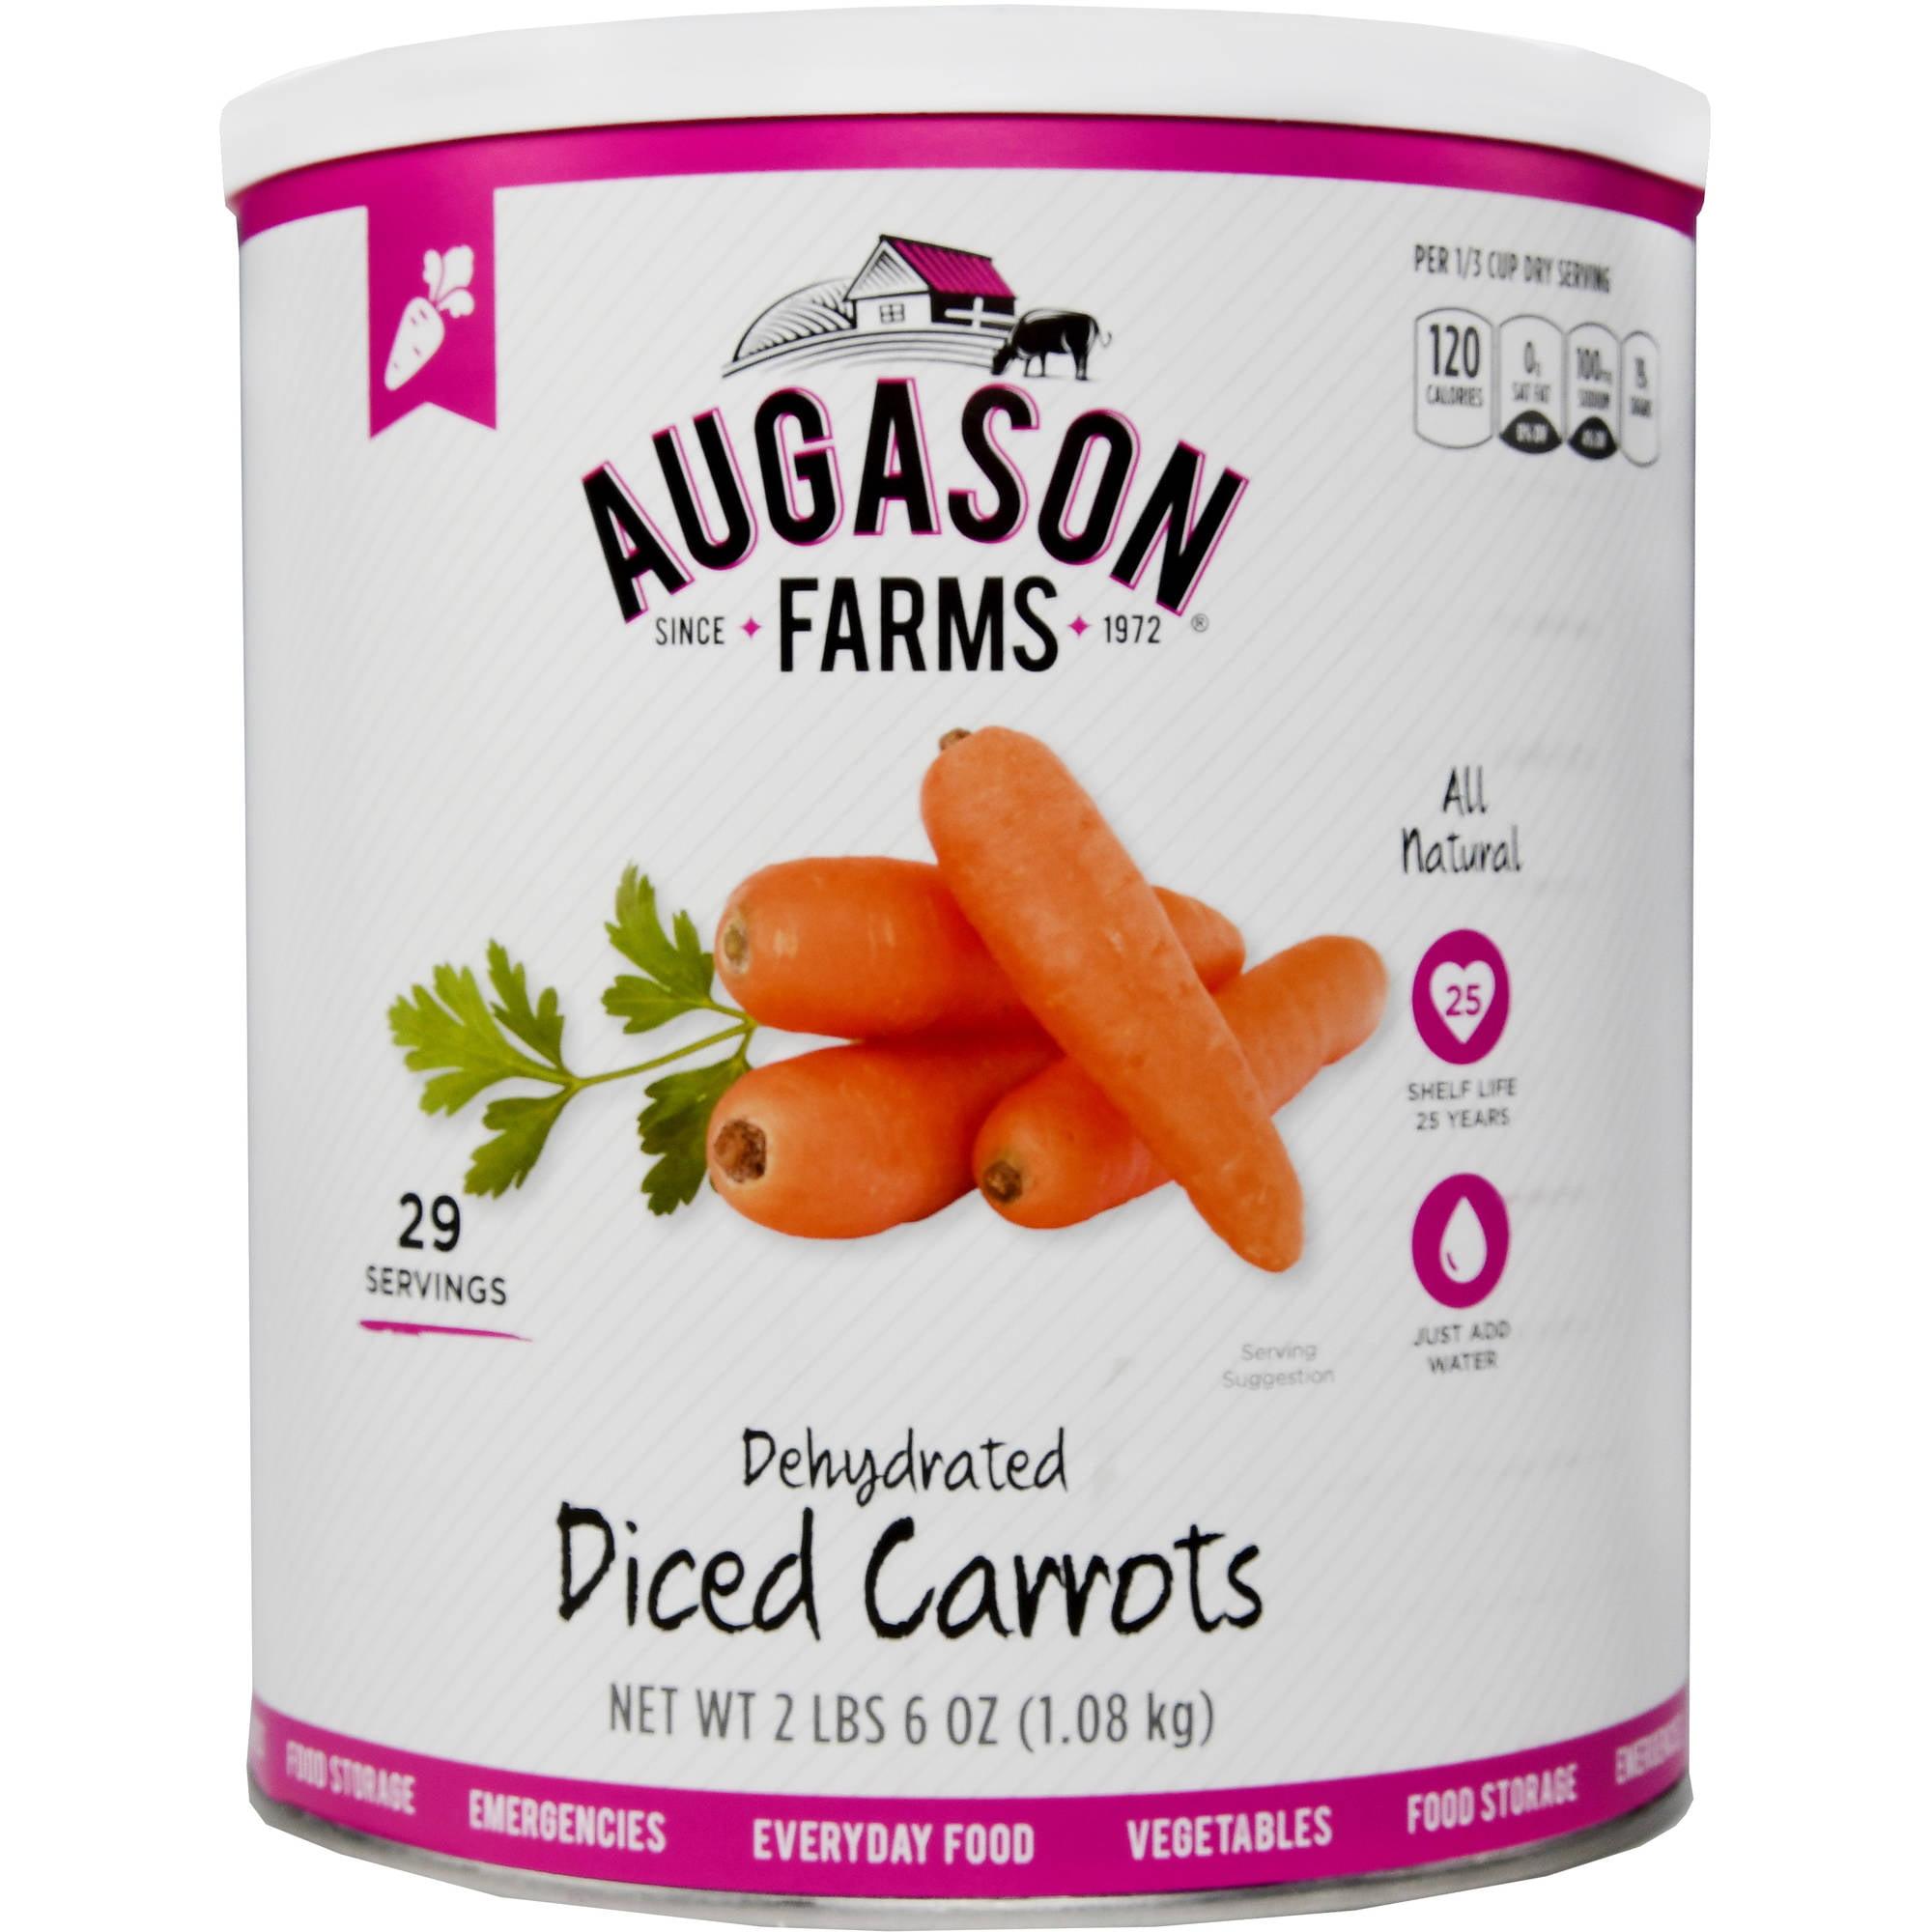 Augason Farms Emergency Food Dehydrated Diced Carrots, 38 oz by Generic